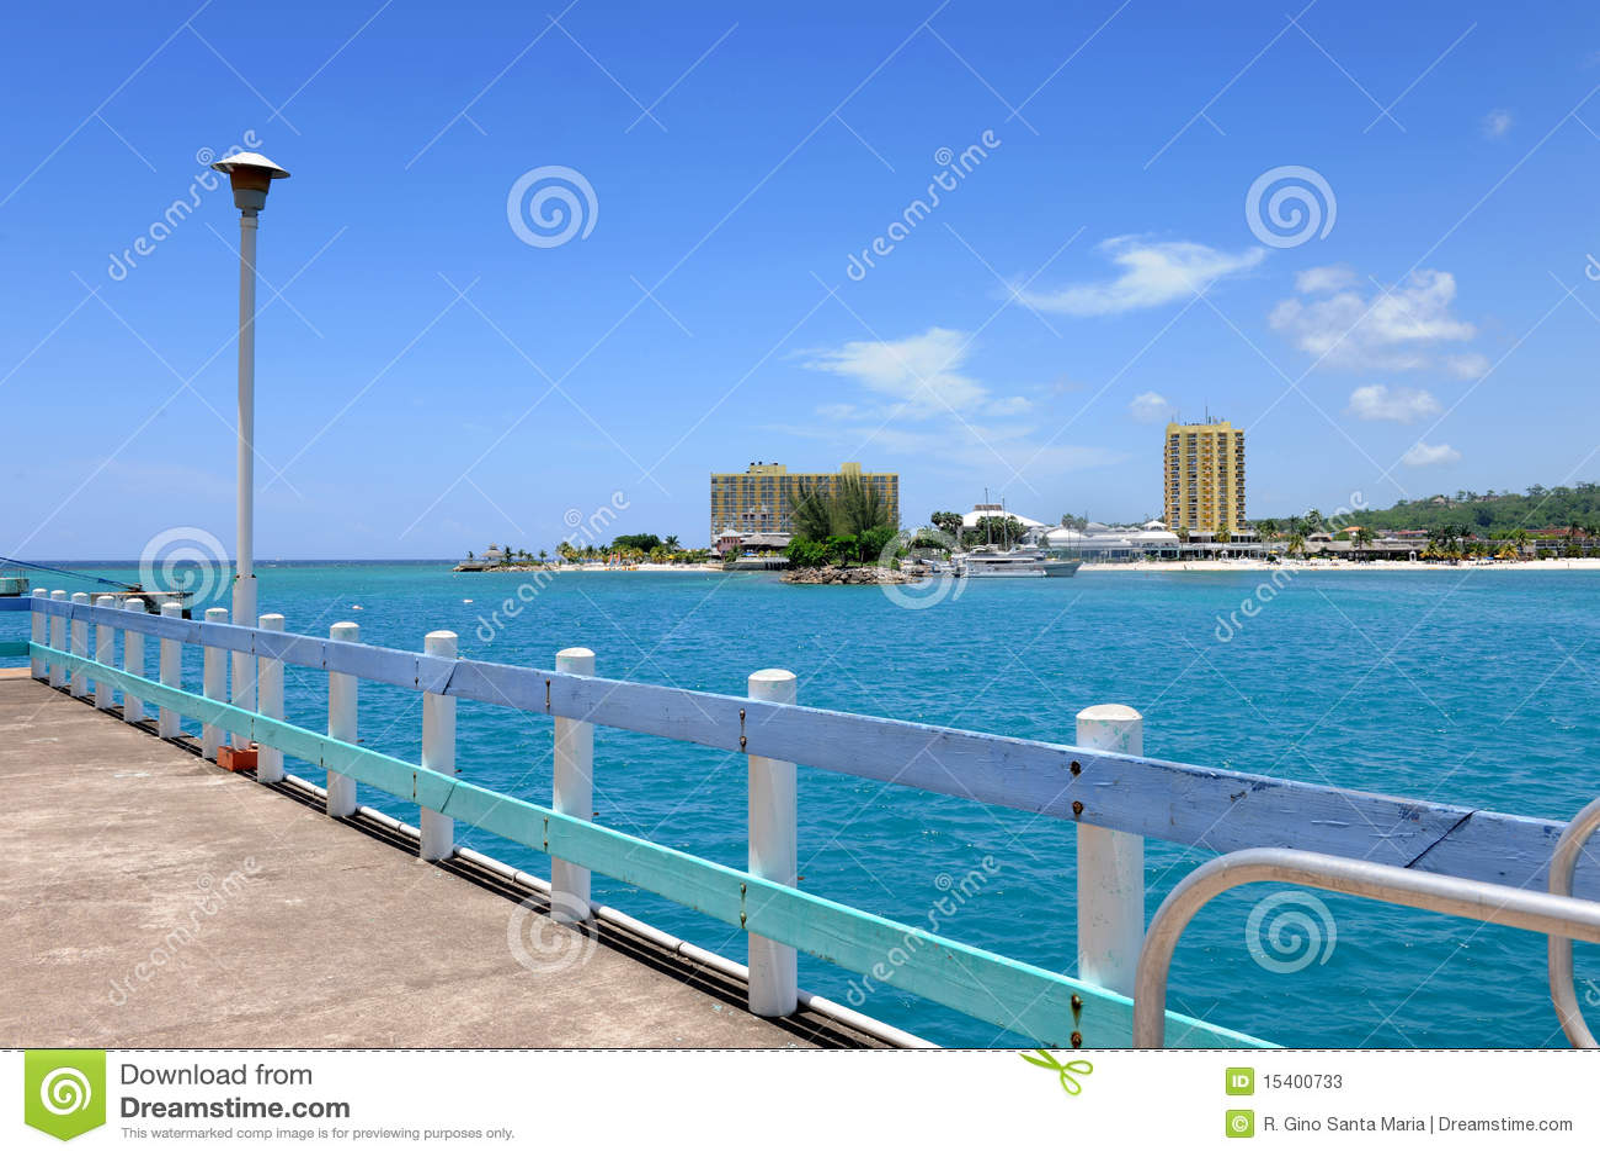 port-ocho-rios-jamaica-15400733 Jamaican Pport Application Form on